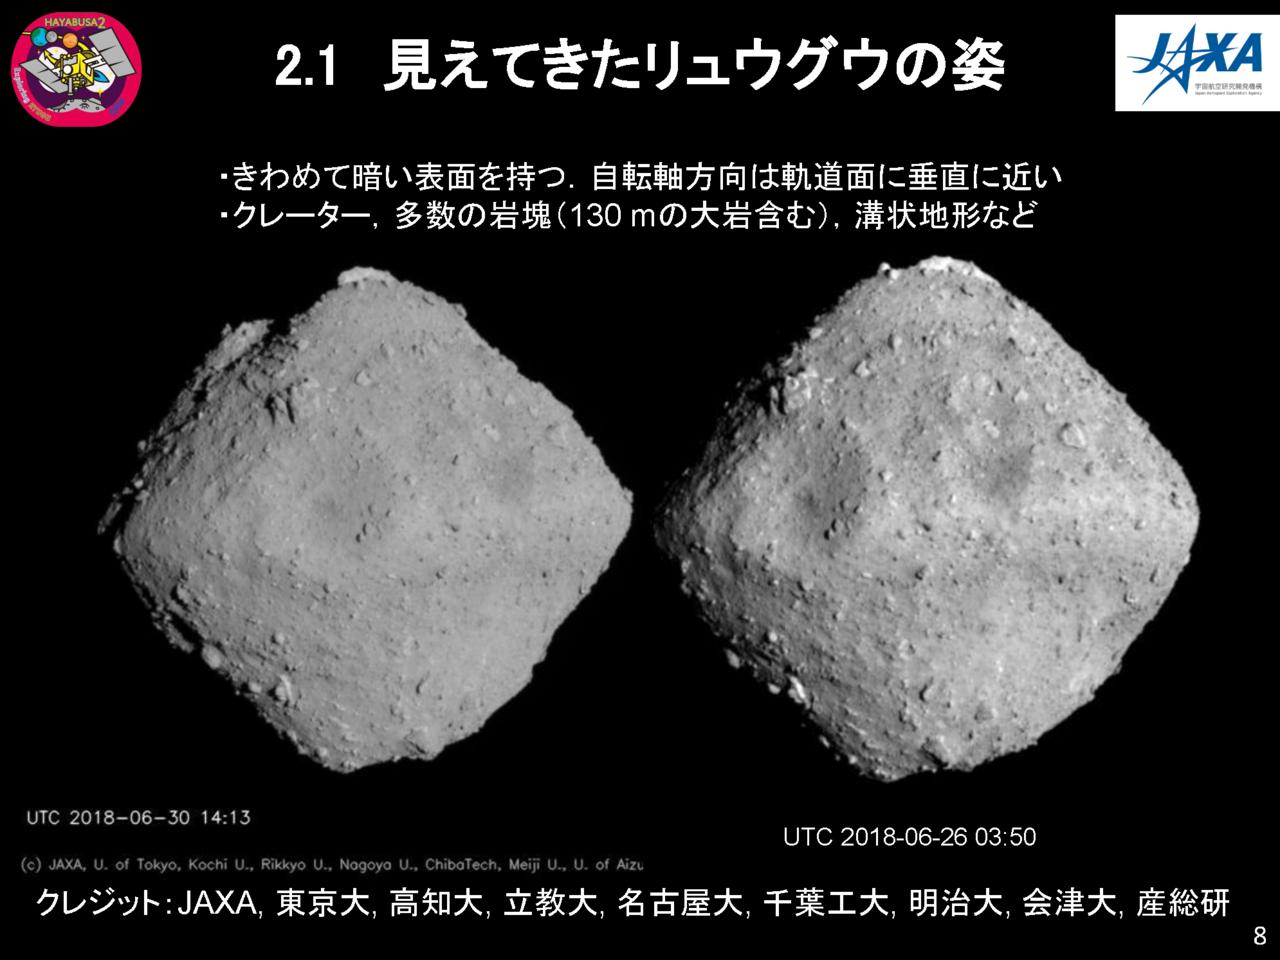 f:id:Imamura:20180719131703p:plain